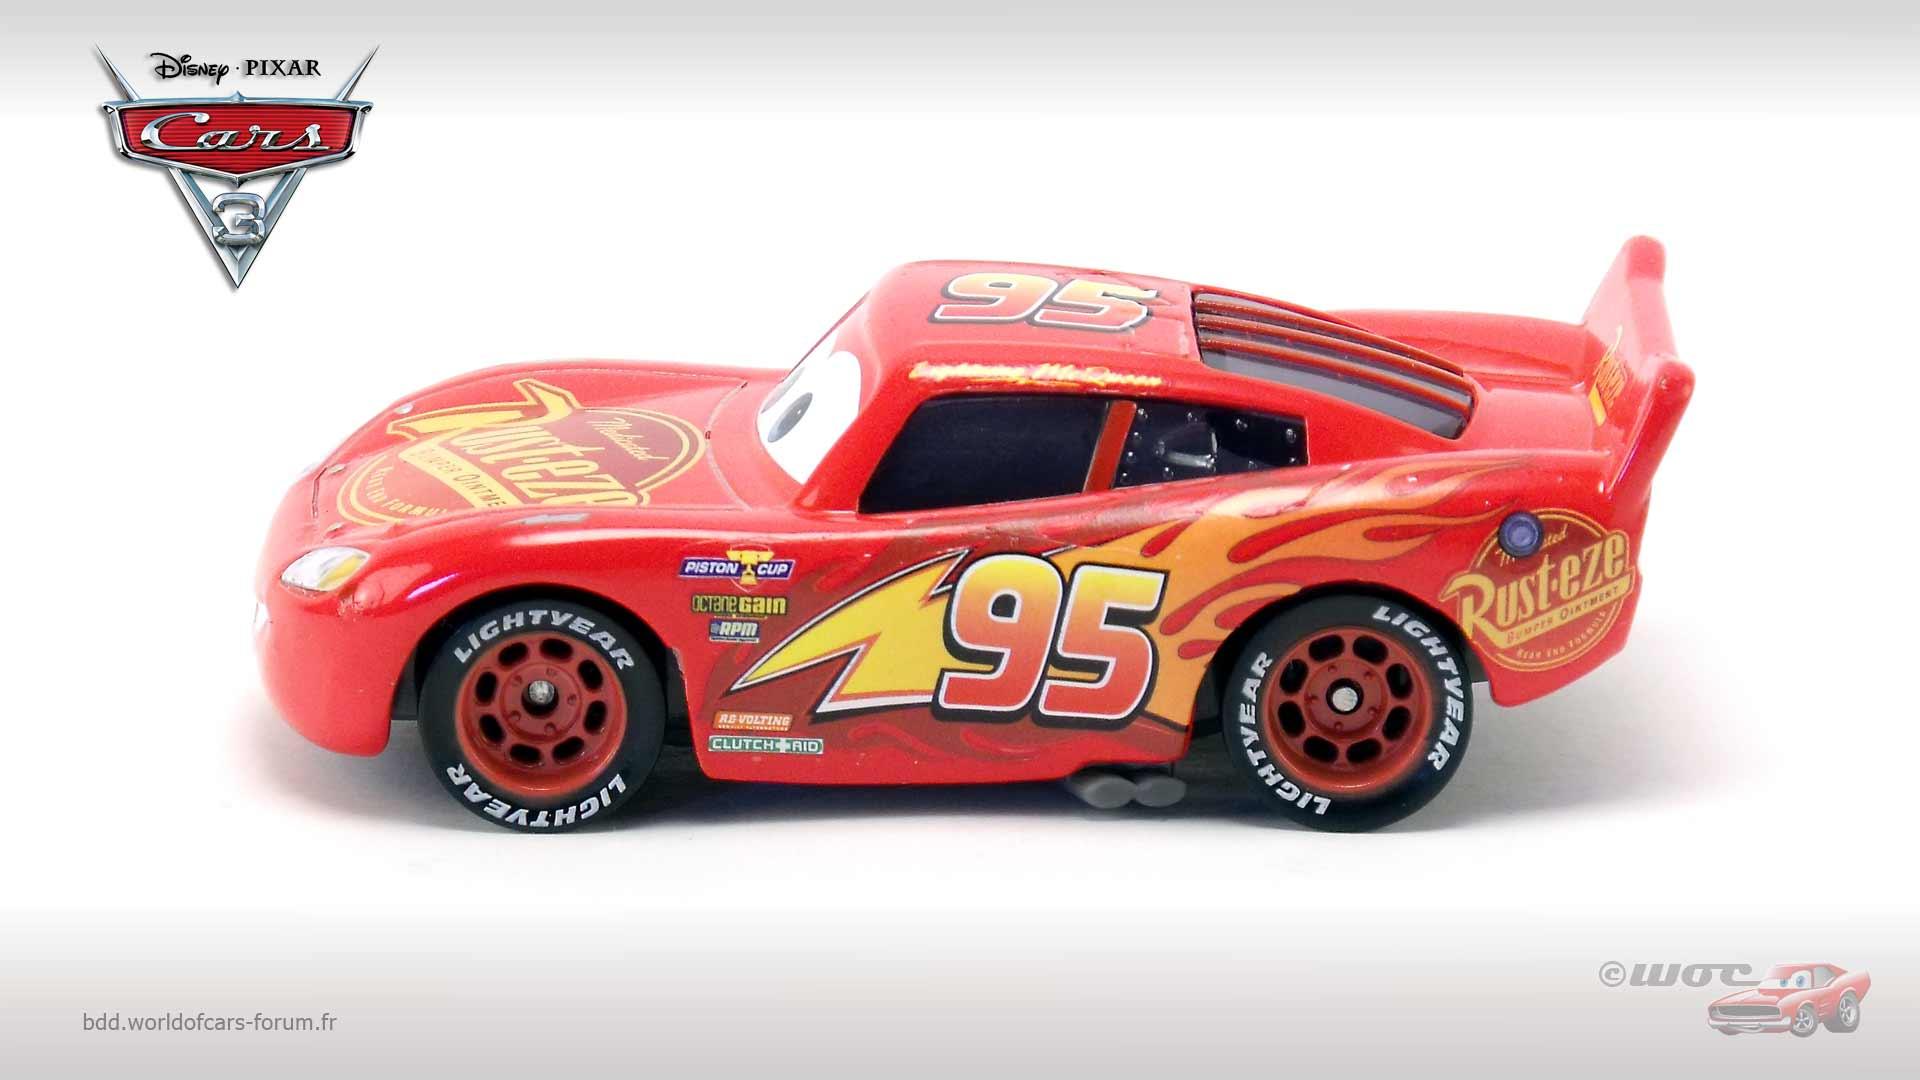 World of cars pr sentation du personnage flash mcqueen lightning mcqueen - Auto flash mcqueen ...